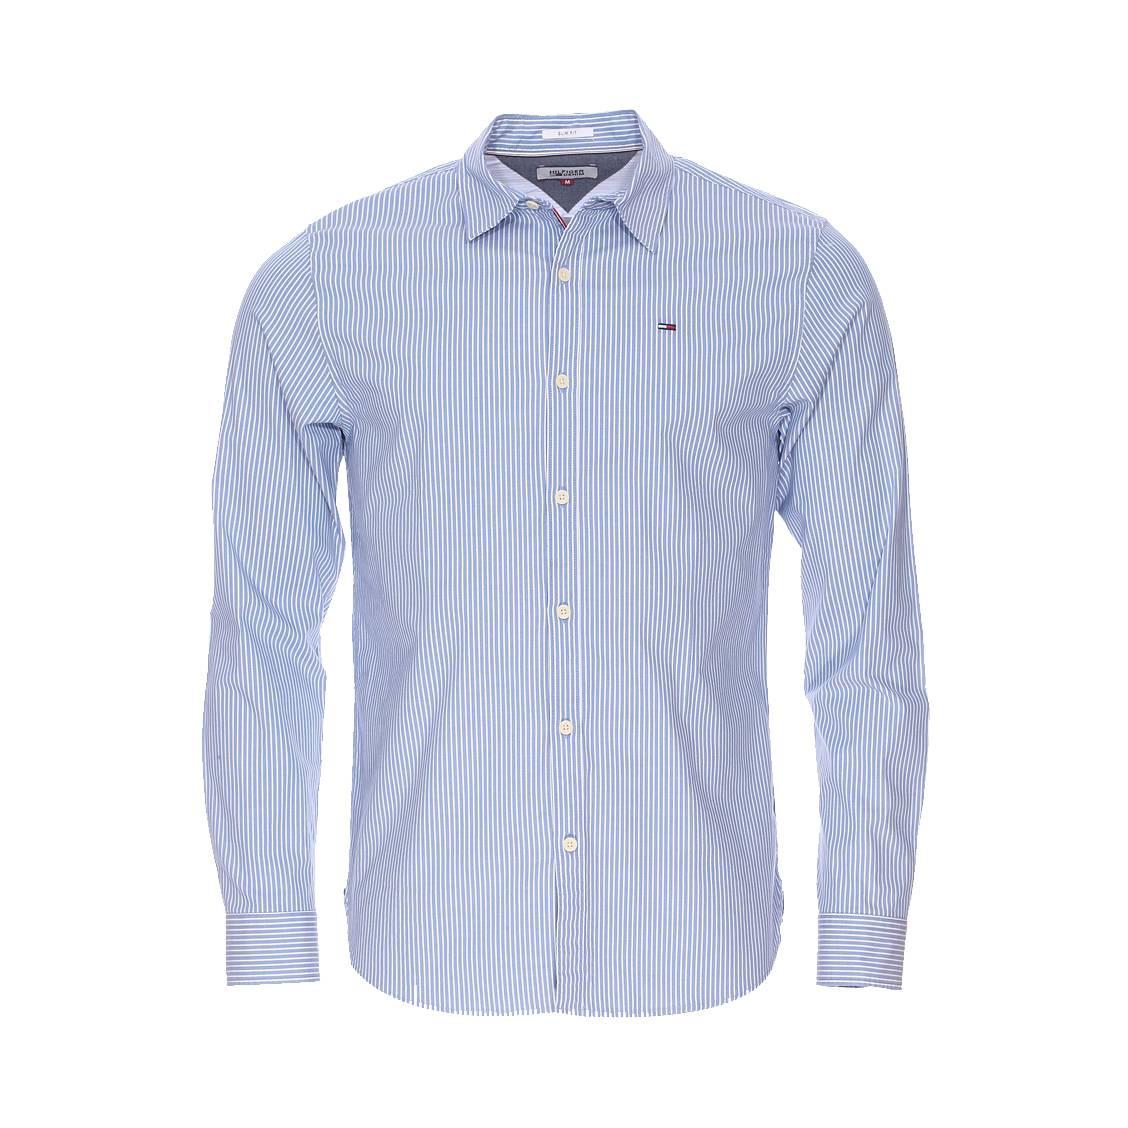 chemise cintr e hilfiger denim rayures bleues et blanches rue des hommes. Black Bedroom Furniture Sets. Home Design Ideas